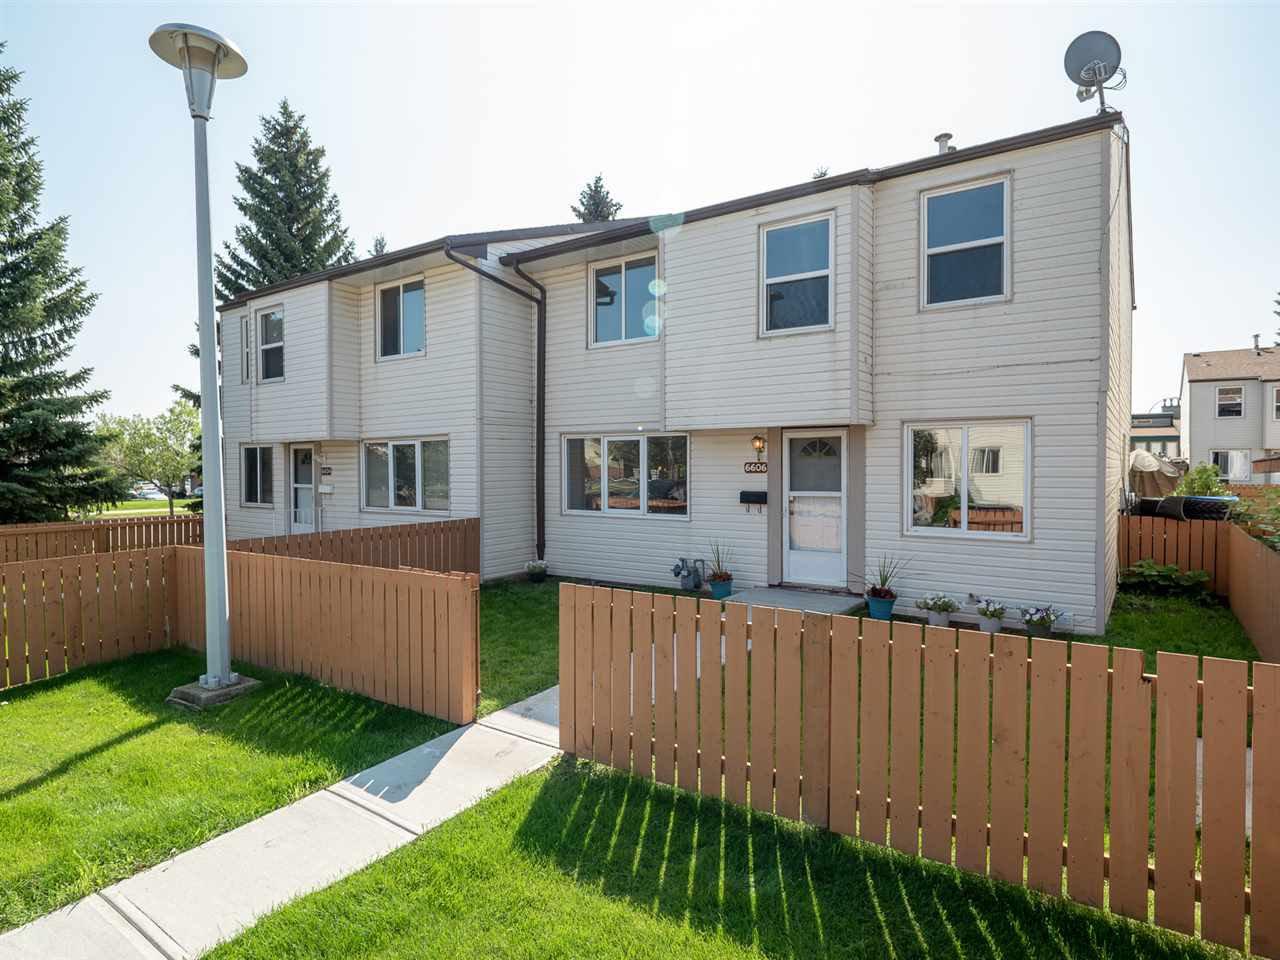 Main Photo: 6606 178 Street in Edmonton: Zone 20 Townhouse for sale : MLS®# E4169994